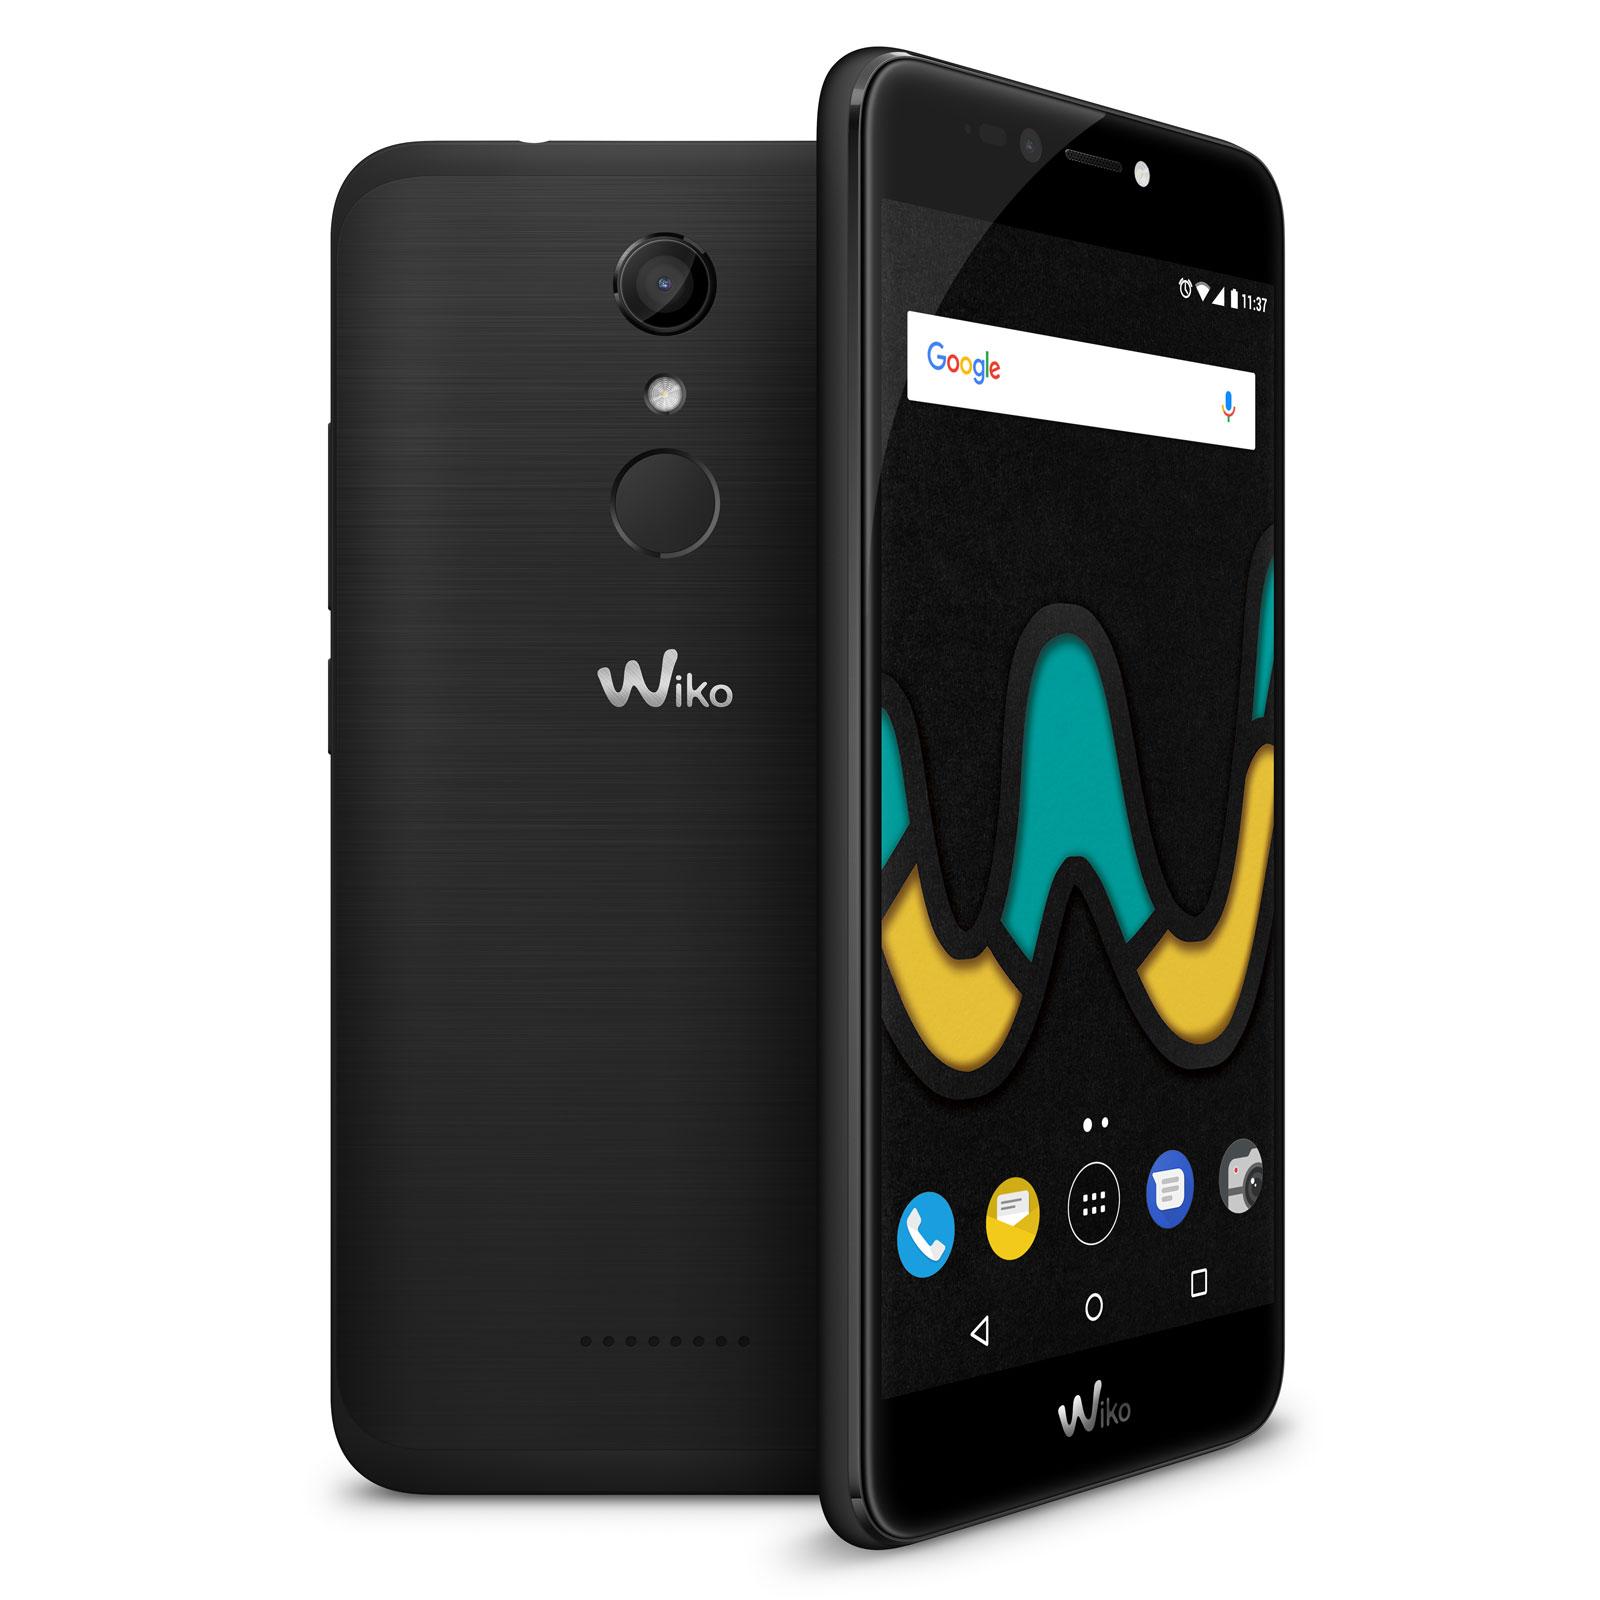 "Mobile & smartphone Wiko Upulse Noir Smartphone 4G-LTE Dual SIM - ARM Cortex-A53 Quad-Core 1.3 GHz - RAM 3 Go - Ecran tactile 5.5"" 720 x 1280 - 32 Go - Bluetooth 4.0 - 3000 mAh - Android 7.0"